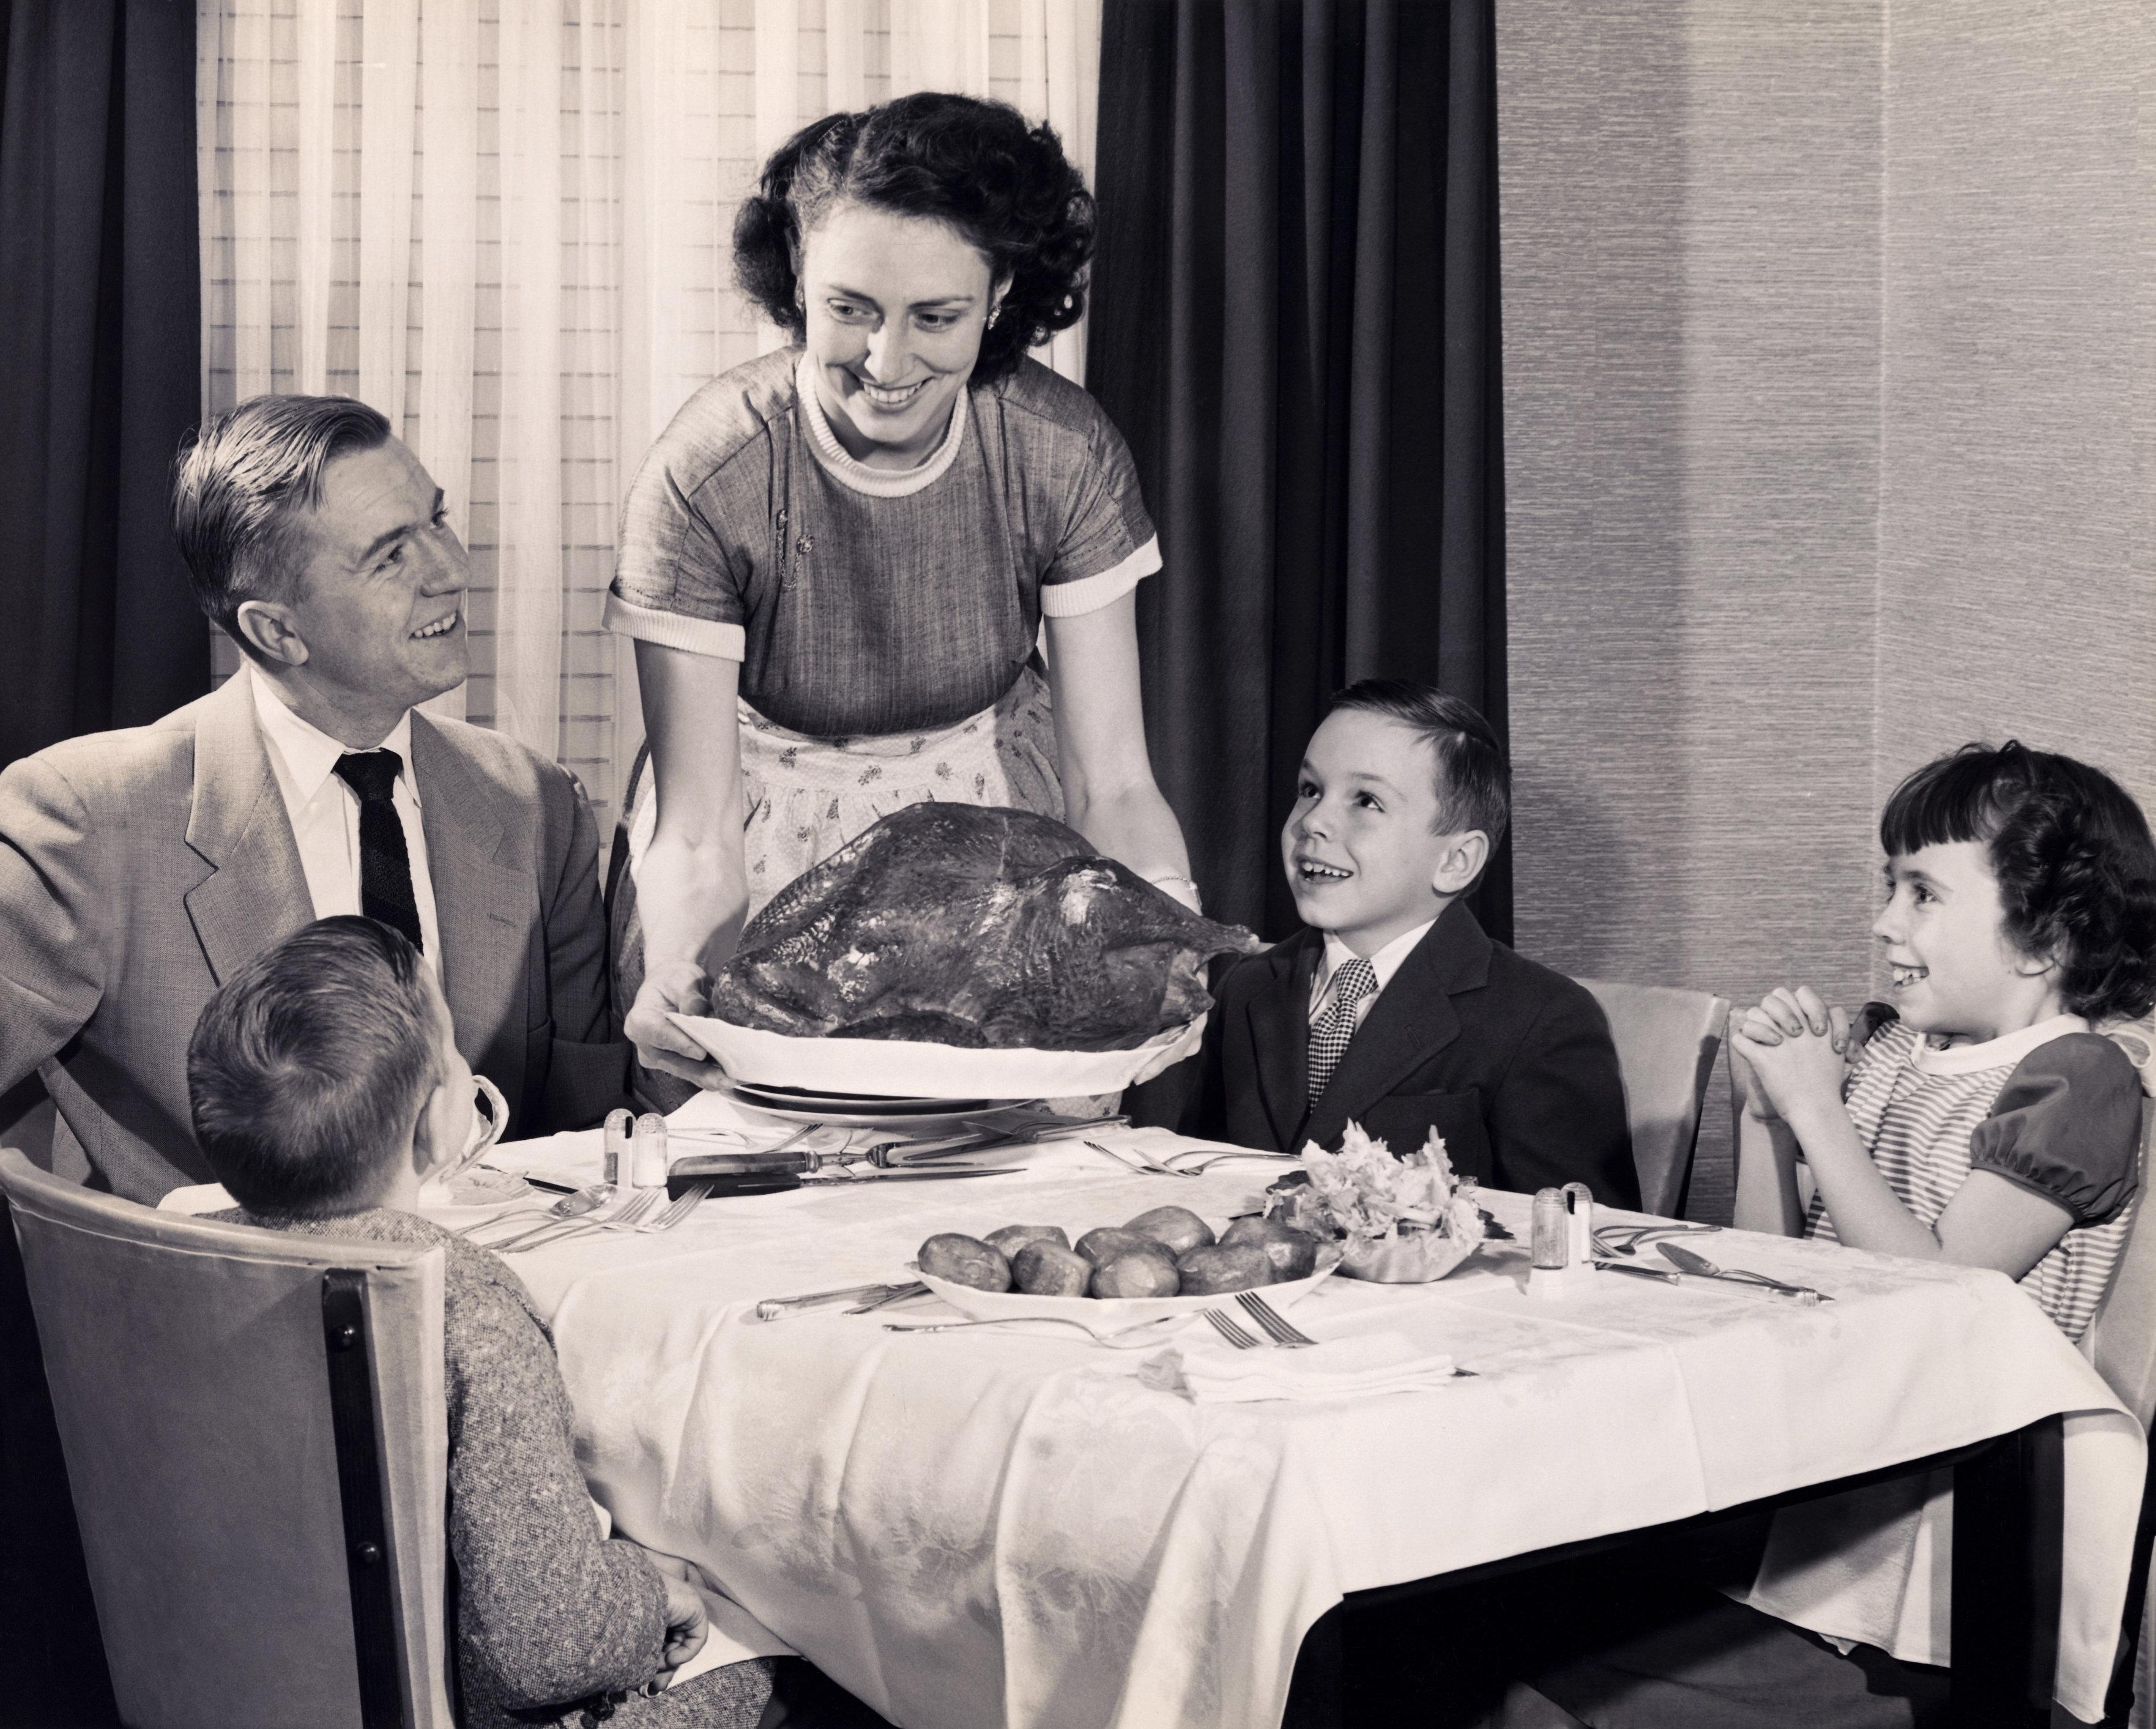 Mother serving a turkey on a platter